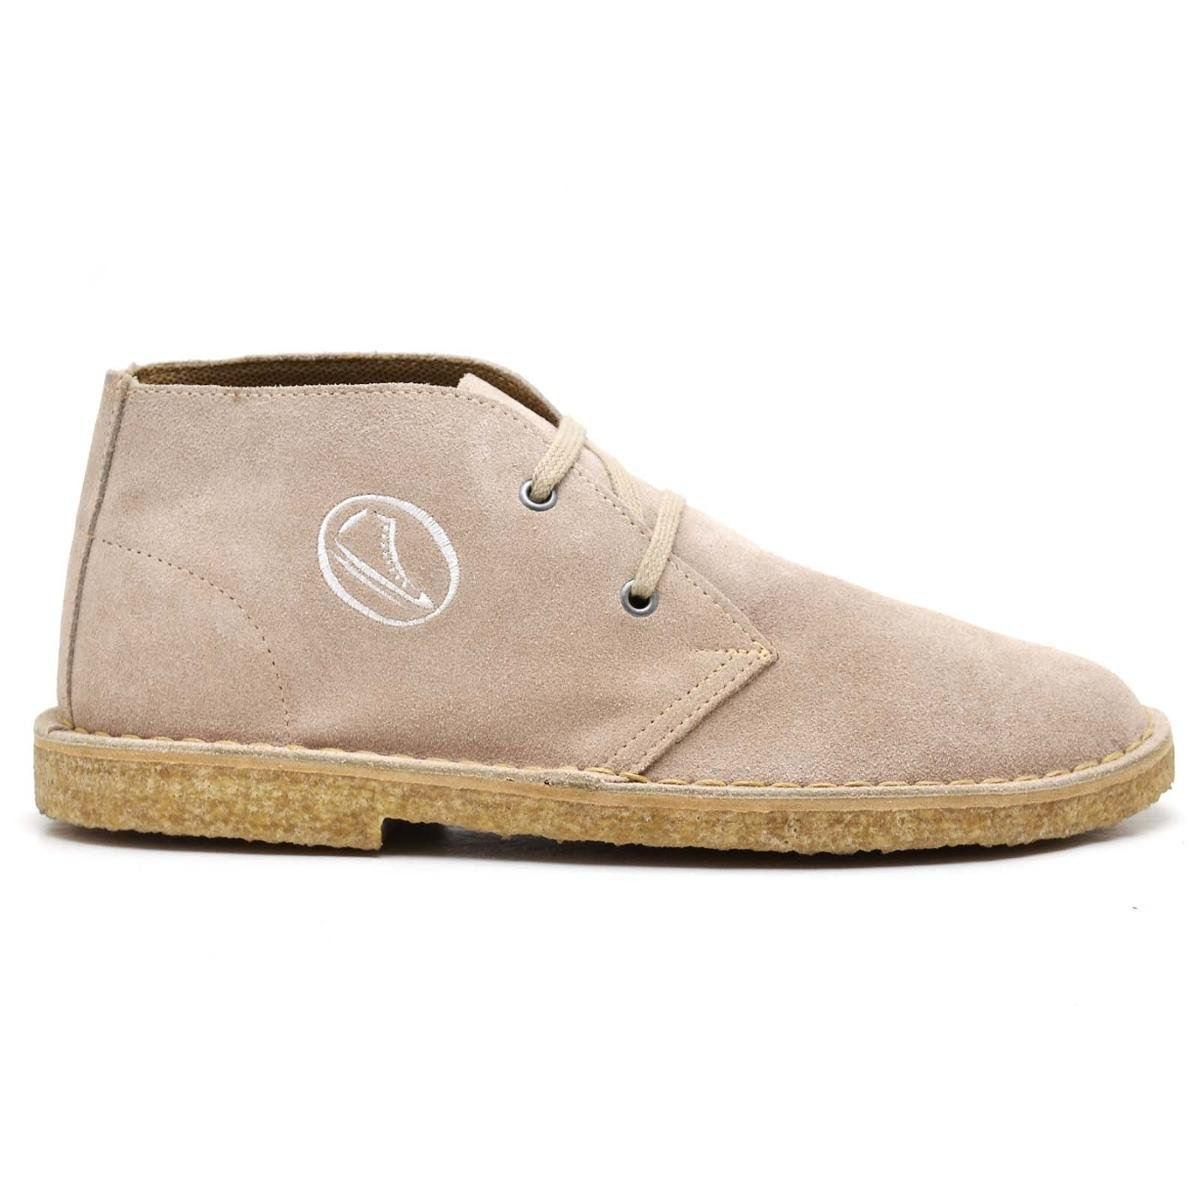 Bota Shoes Franca Top Casual Bege Shoes Top Bota Casual Bege Franca Franca Top Bota B4xfwfYq